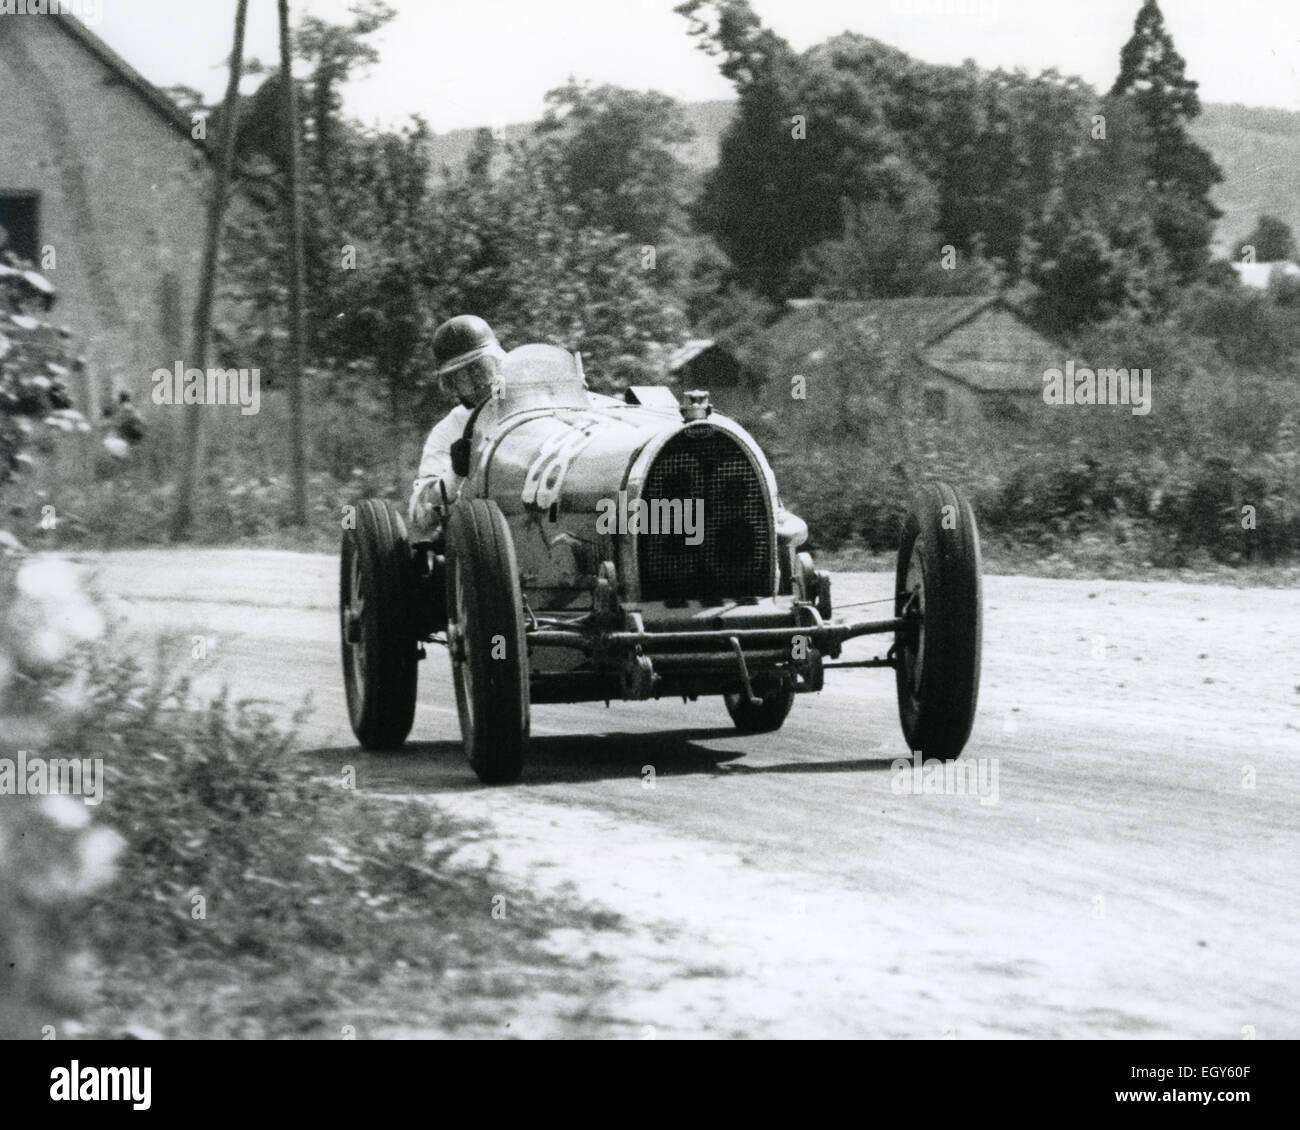 1932 FRENCH GRAND  PRIX Bugatti T54 No 28 was driven by both Earl Howe and Hugh Hamilton - Stock Image